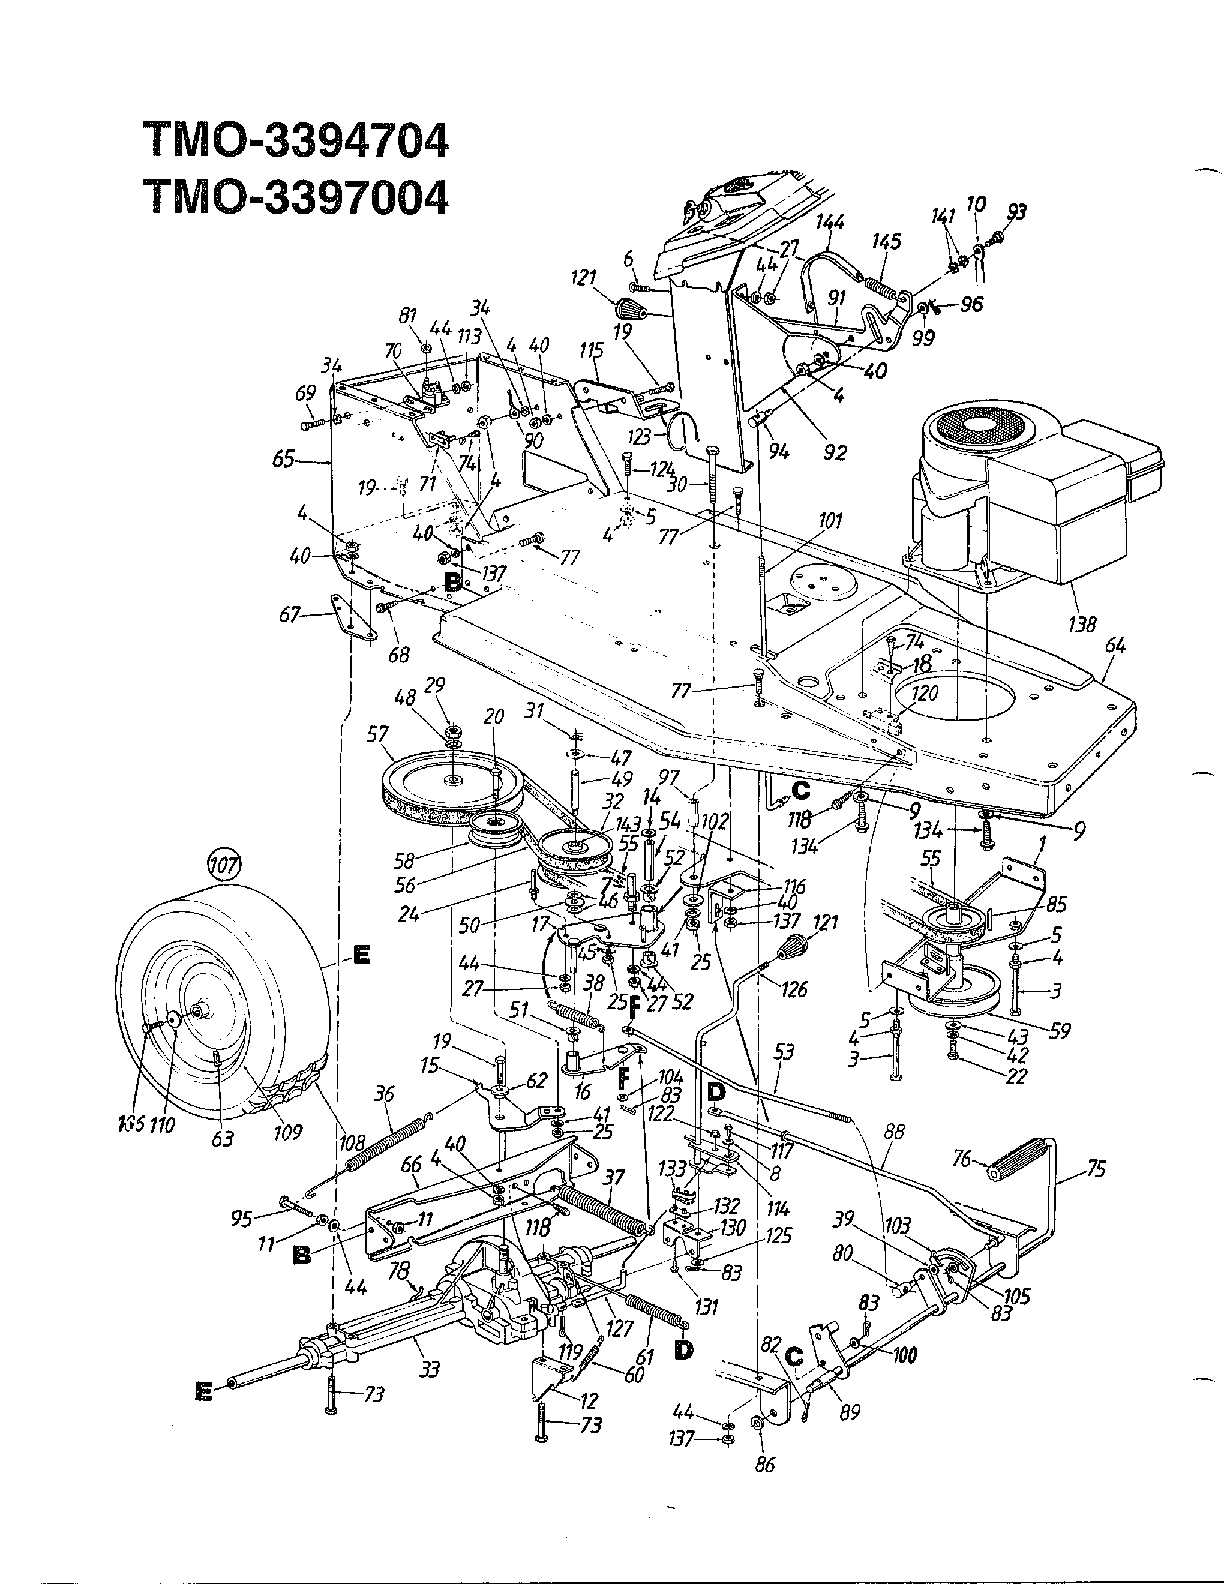 Mtd 1 4 Hp Lawn Mower Wiring Diagram, Mtd, Free Engine